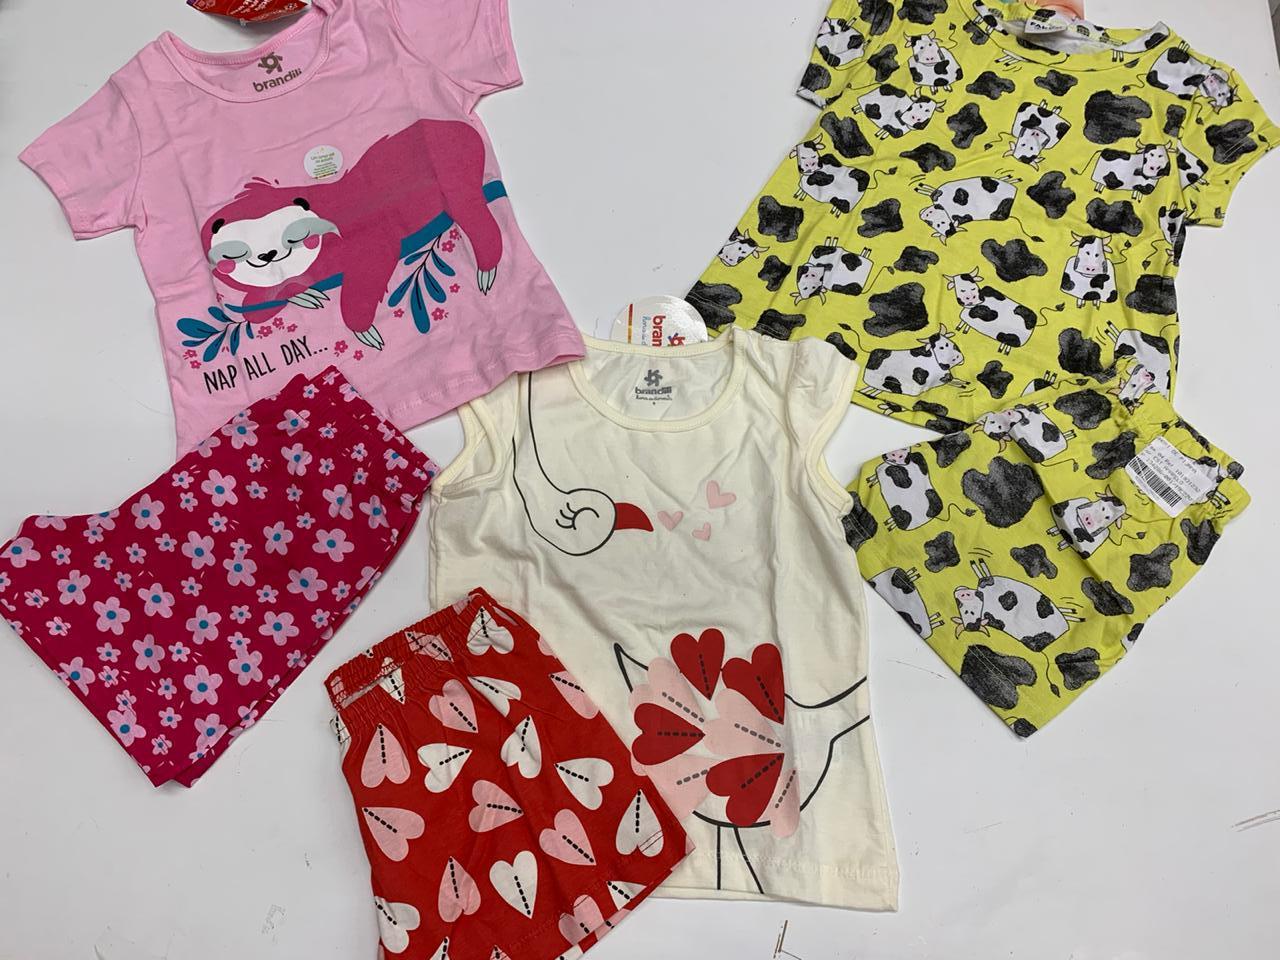 pijamas infantil kit com 3 unidades de menina marcas variadas